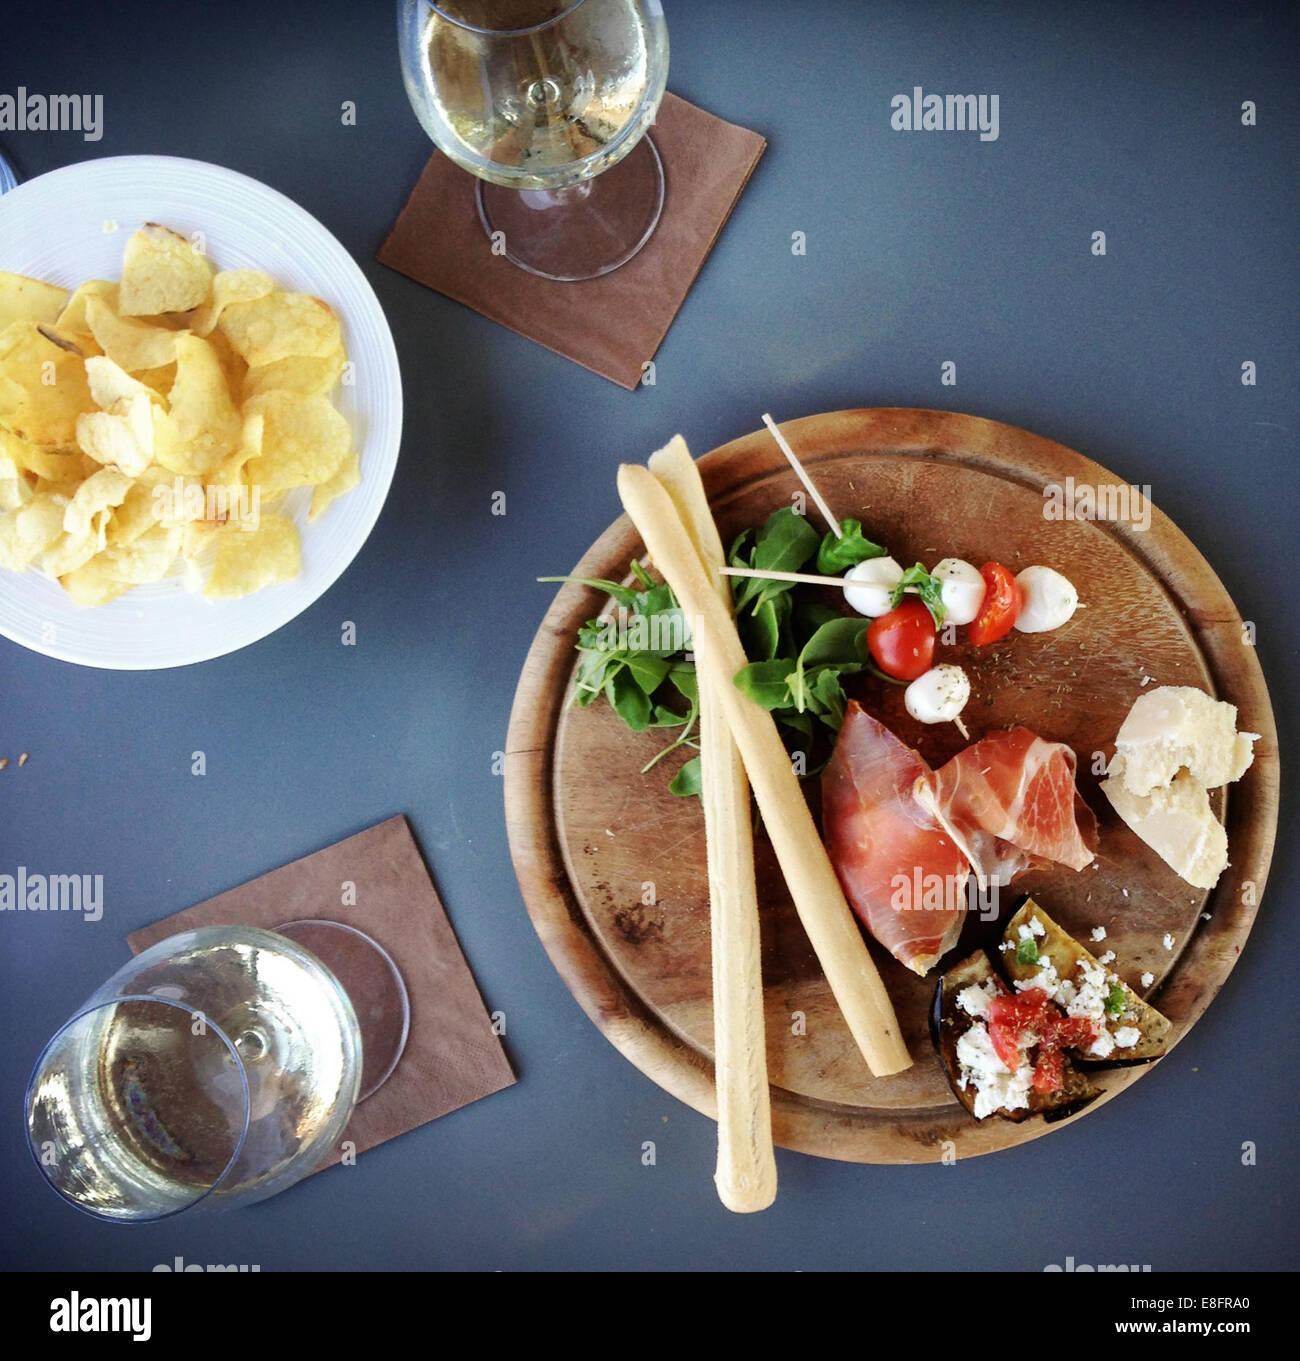 Vista aérea de jamón, queso, parmesana Finger Food y tomates cherry con queso mozzarella Foto de stock